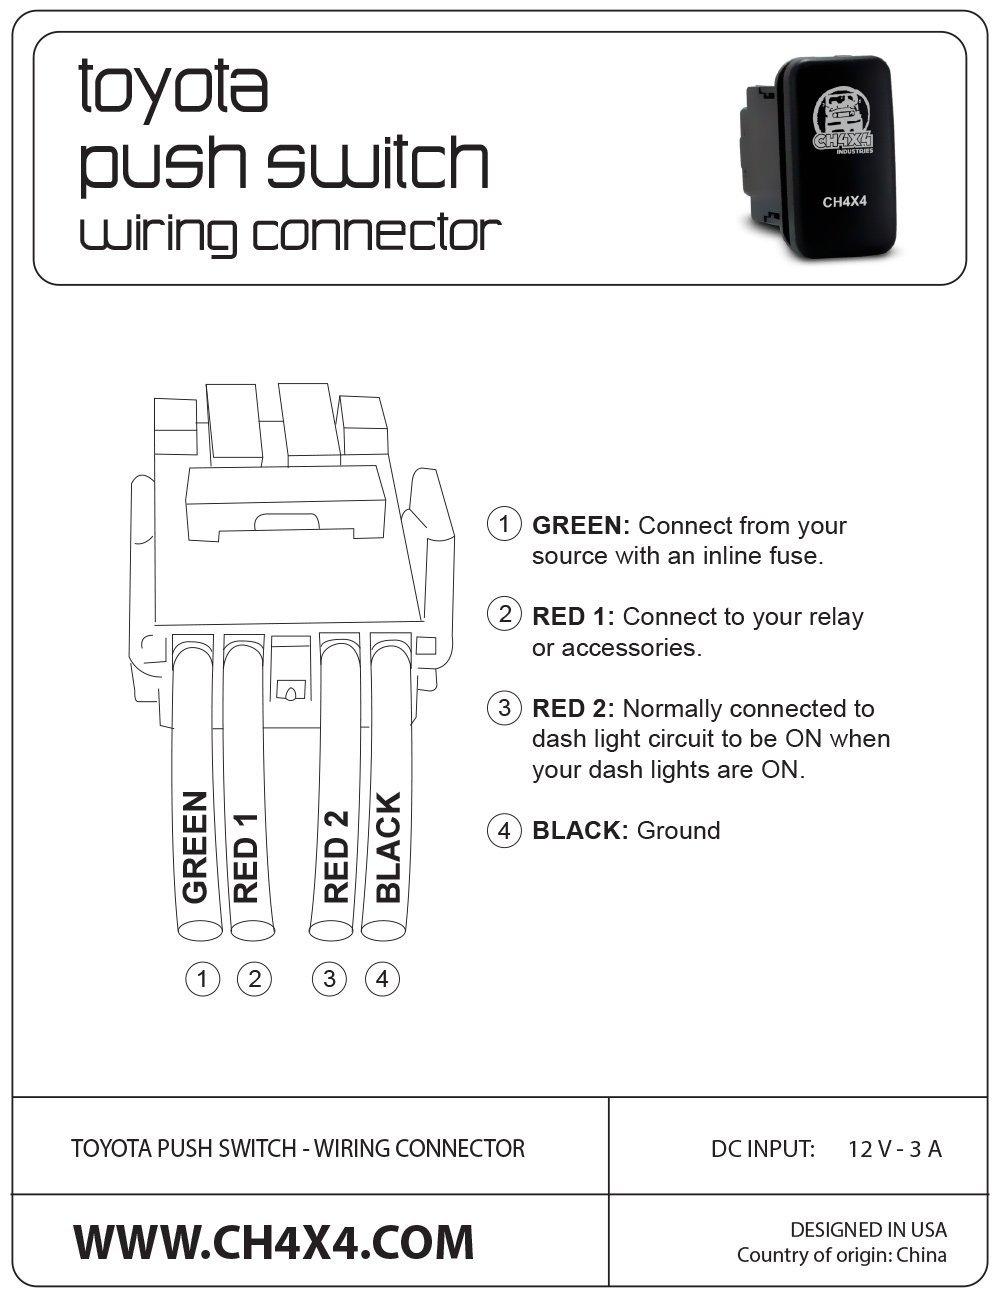 Fabulous Aftermarket Push Switch Wiring Toyota 4Runner Forum Largest Wiring 101 Kwecapipaaccommodationcom